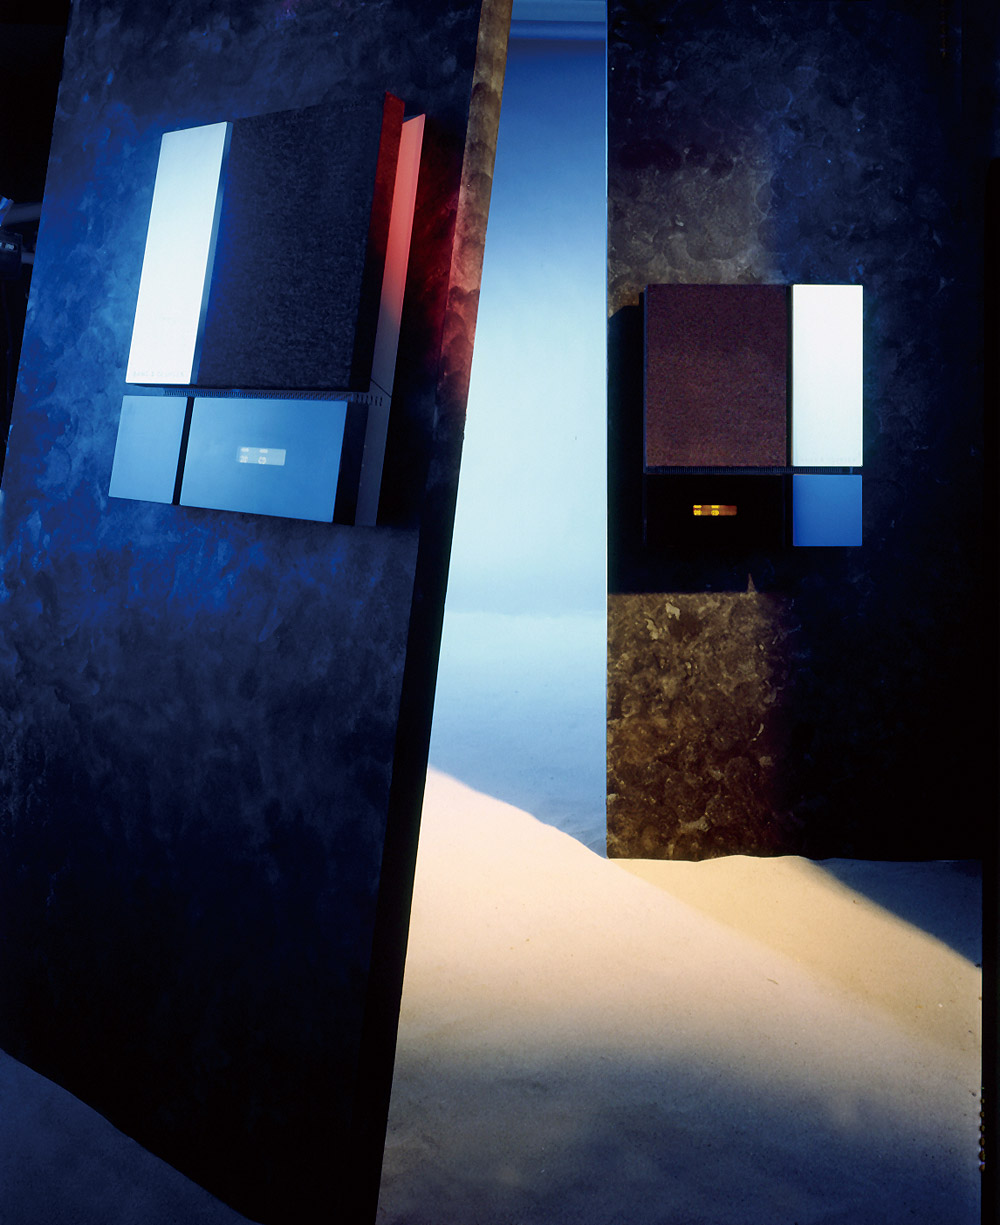 Beolab 3000 & 5000 4500 loudspeakers, B&O, Beolab 3000 & 5000 4500 音響,丹麥B&O